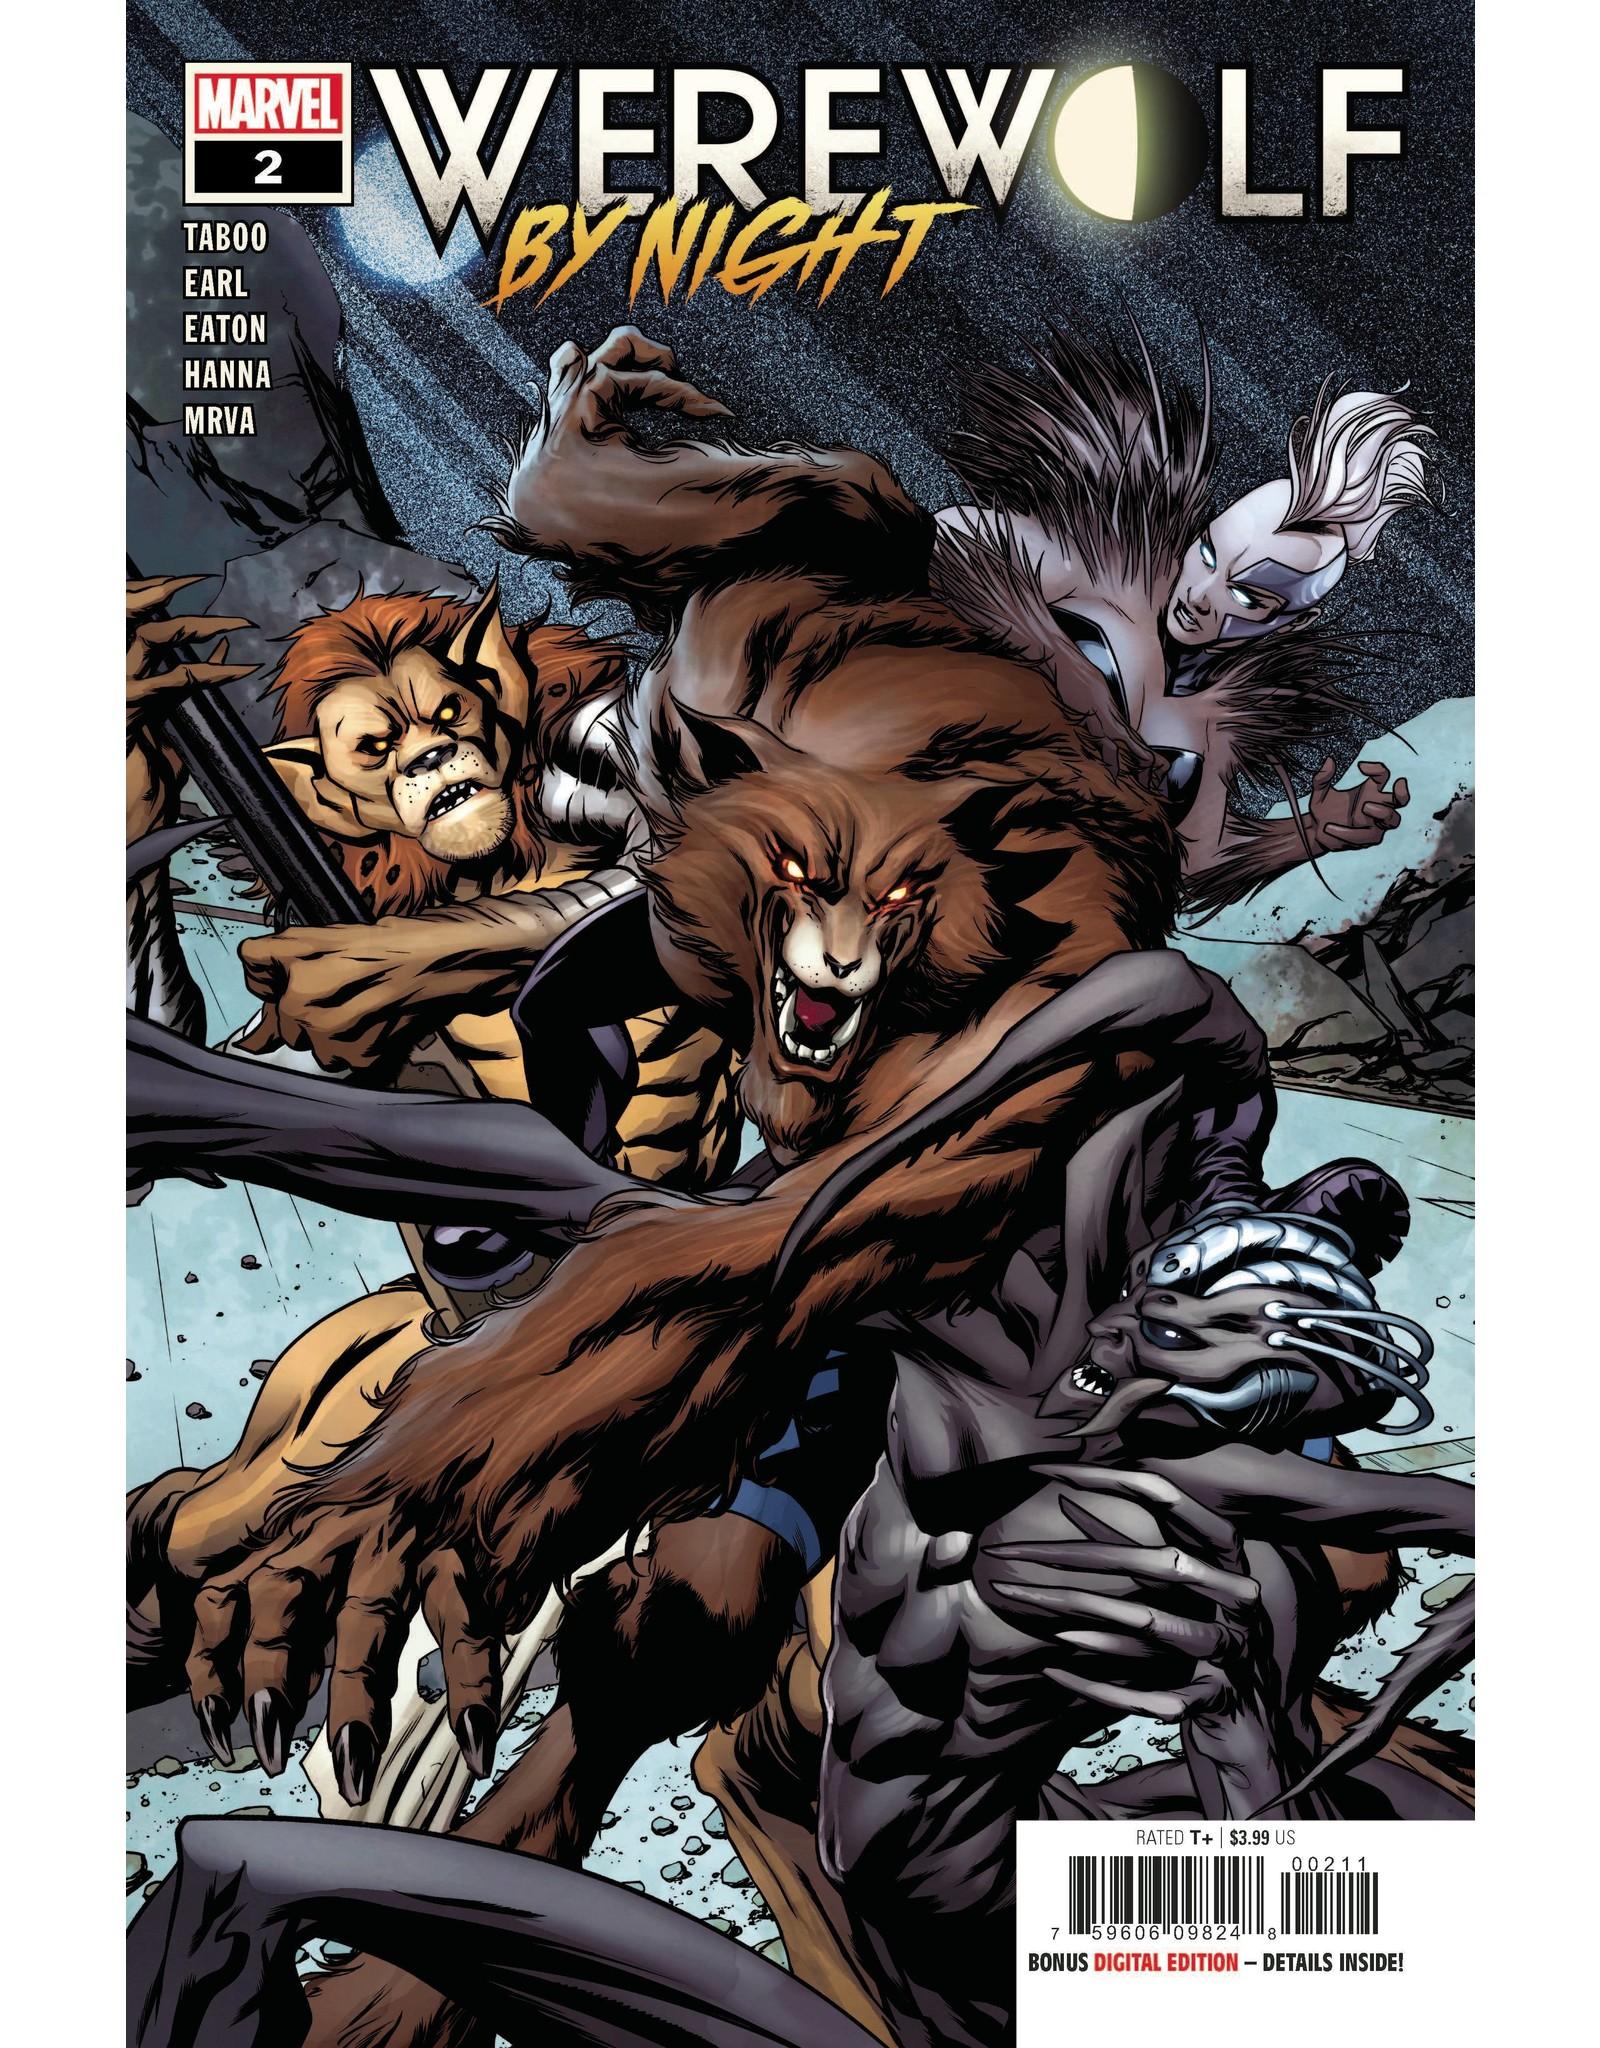 MARVEL COMICS WEREWOLF BY NIGHT #2 (OF 4)